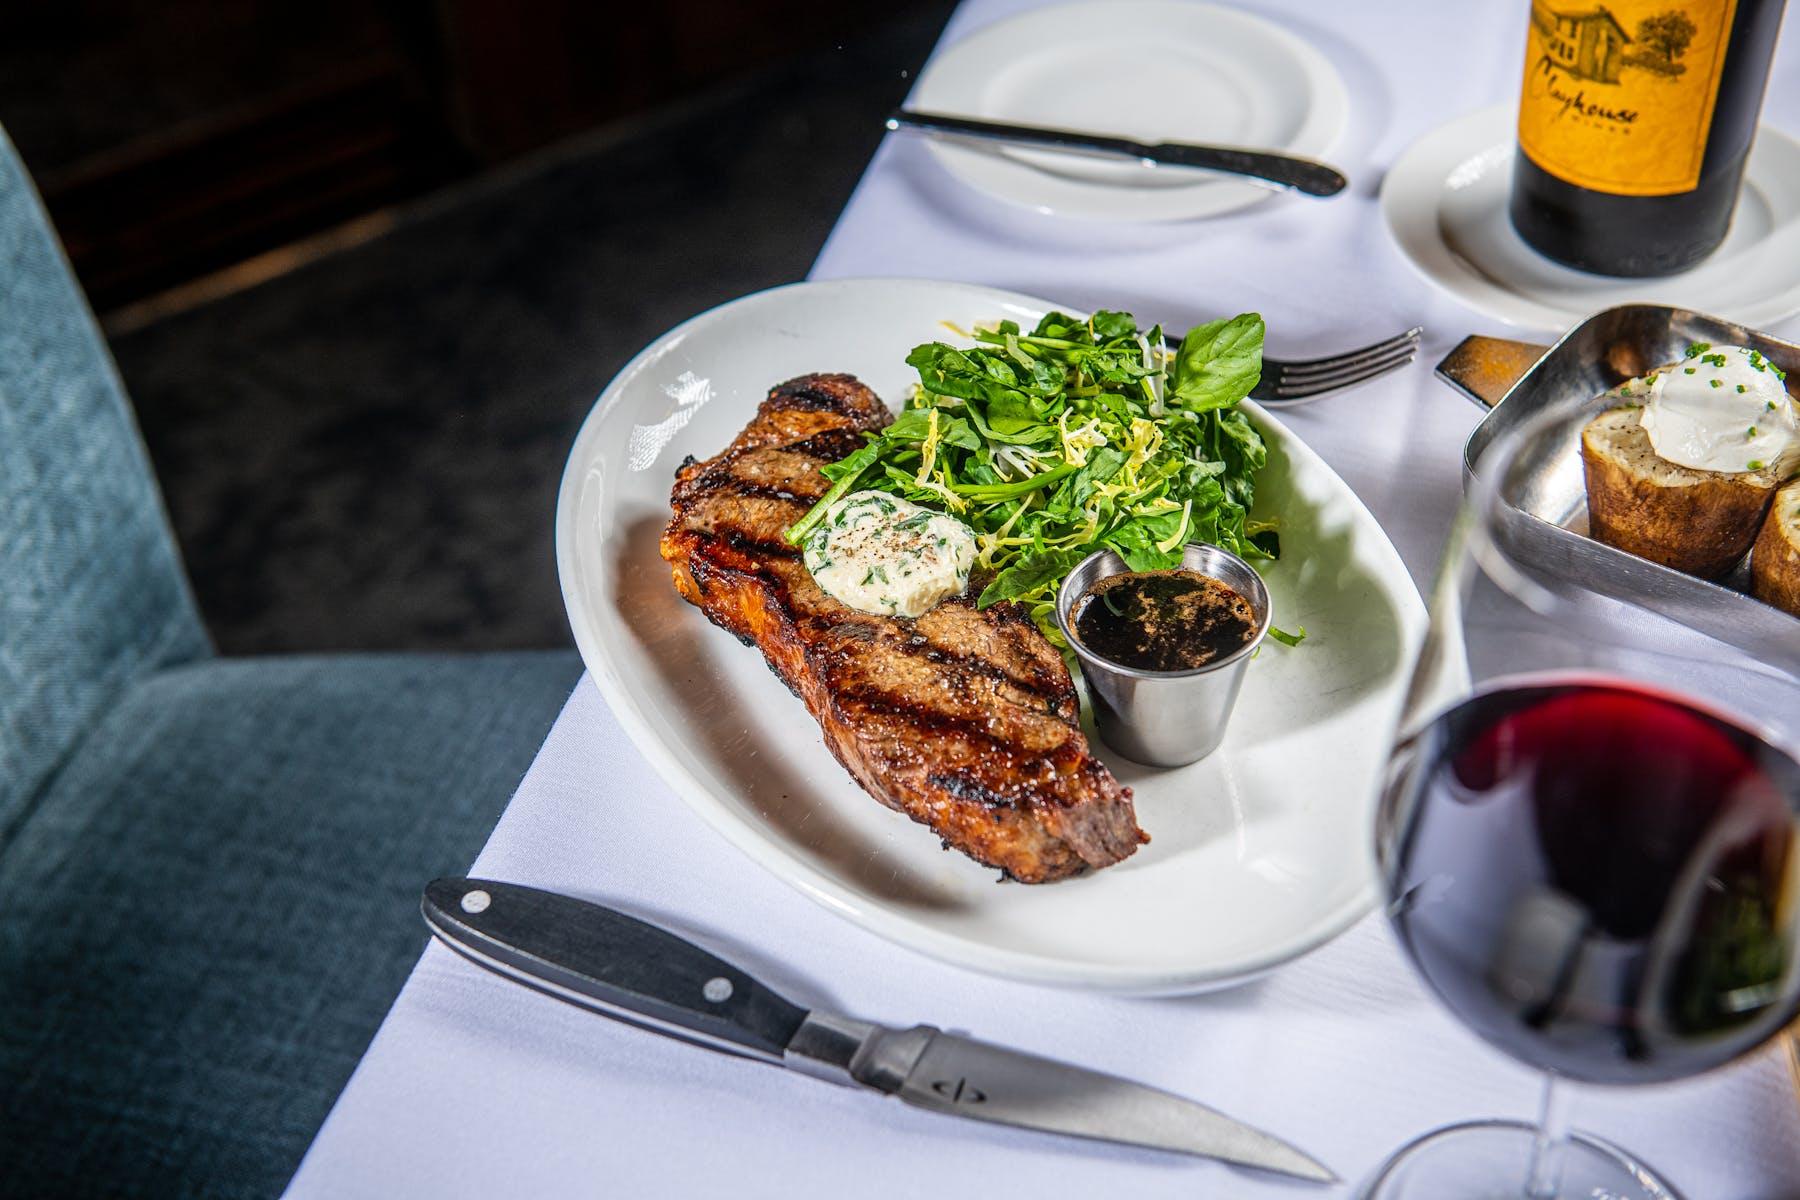 steak on a table